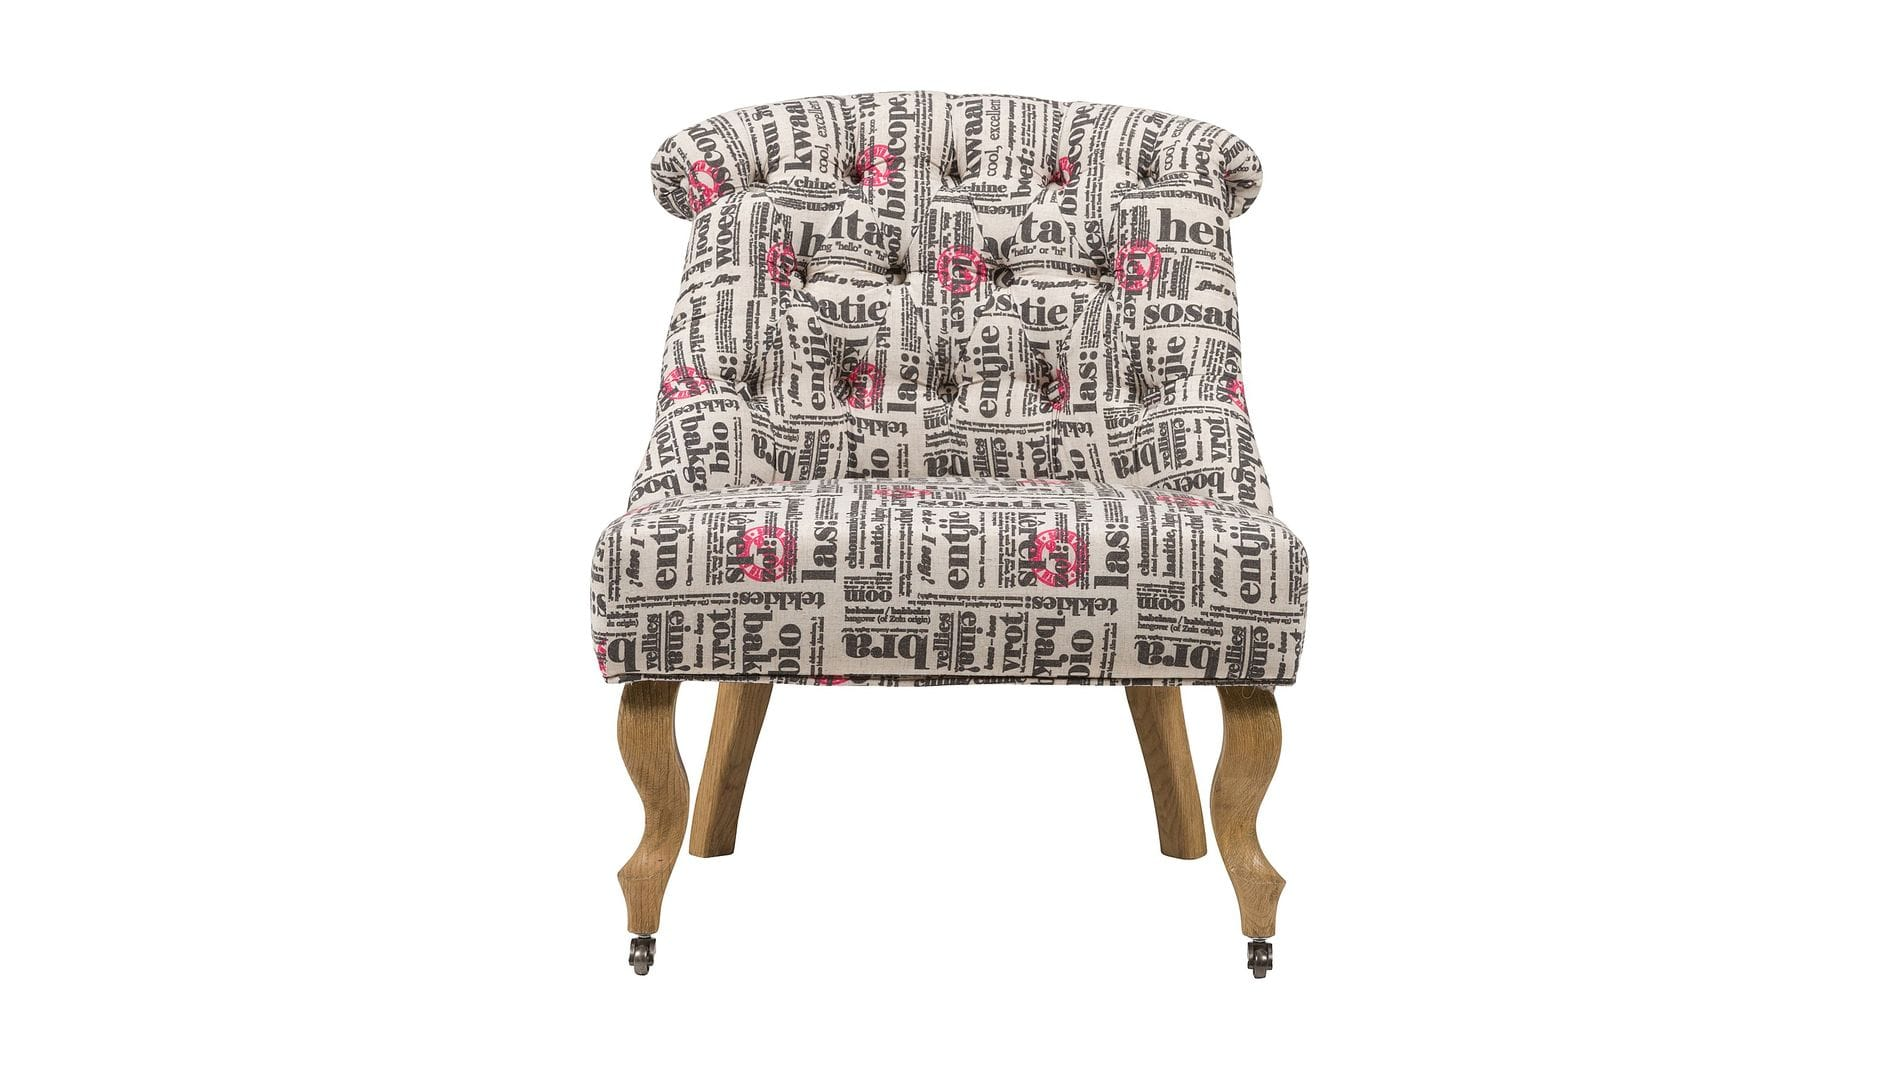 Кресло Amelie French Country Chair Надписи М